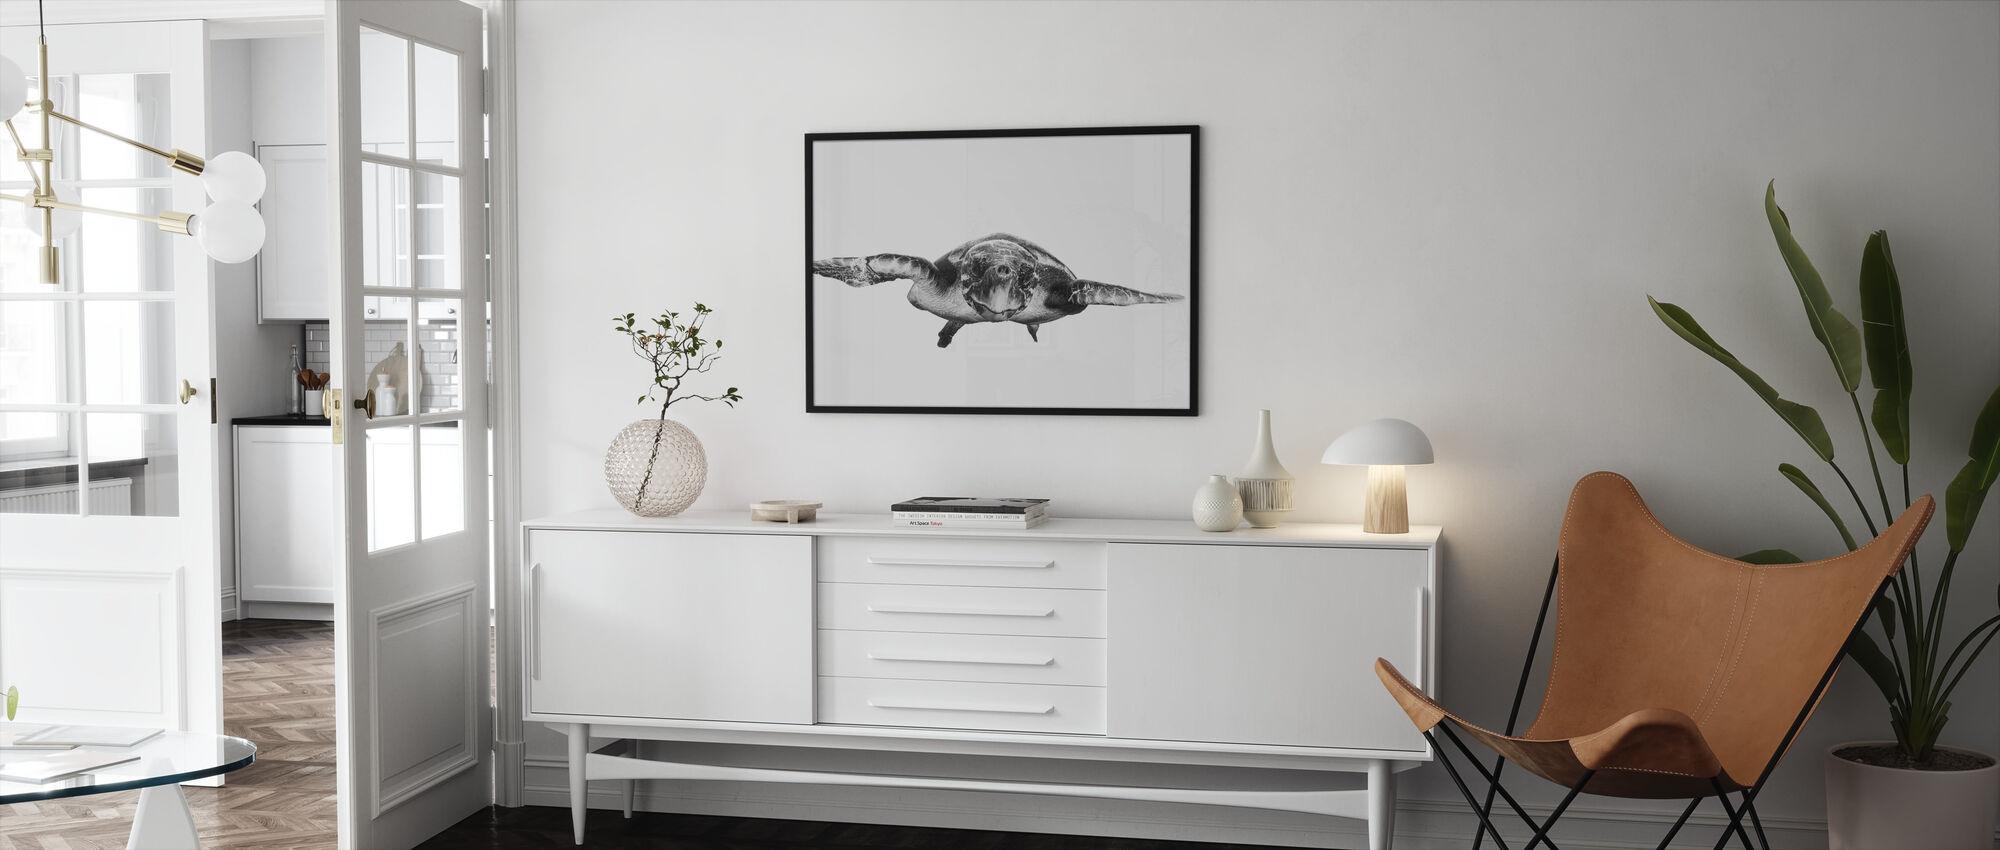 White and Turtle - Framed print - Living Room